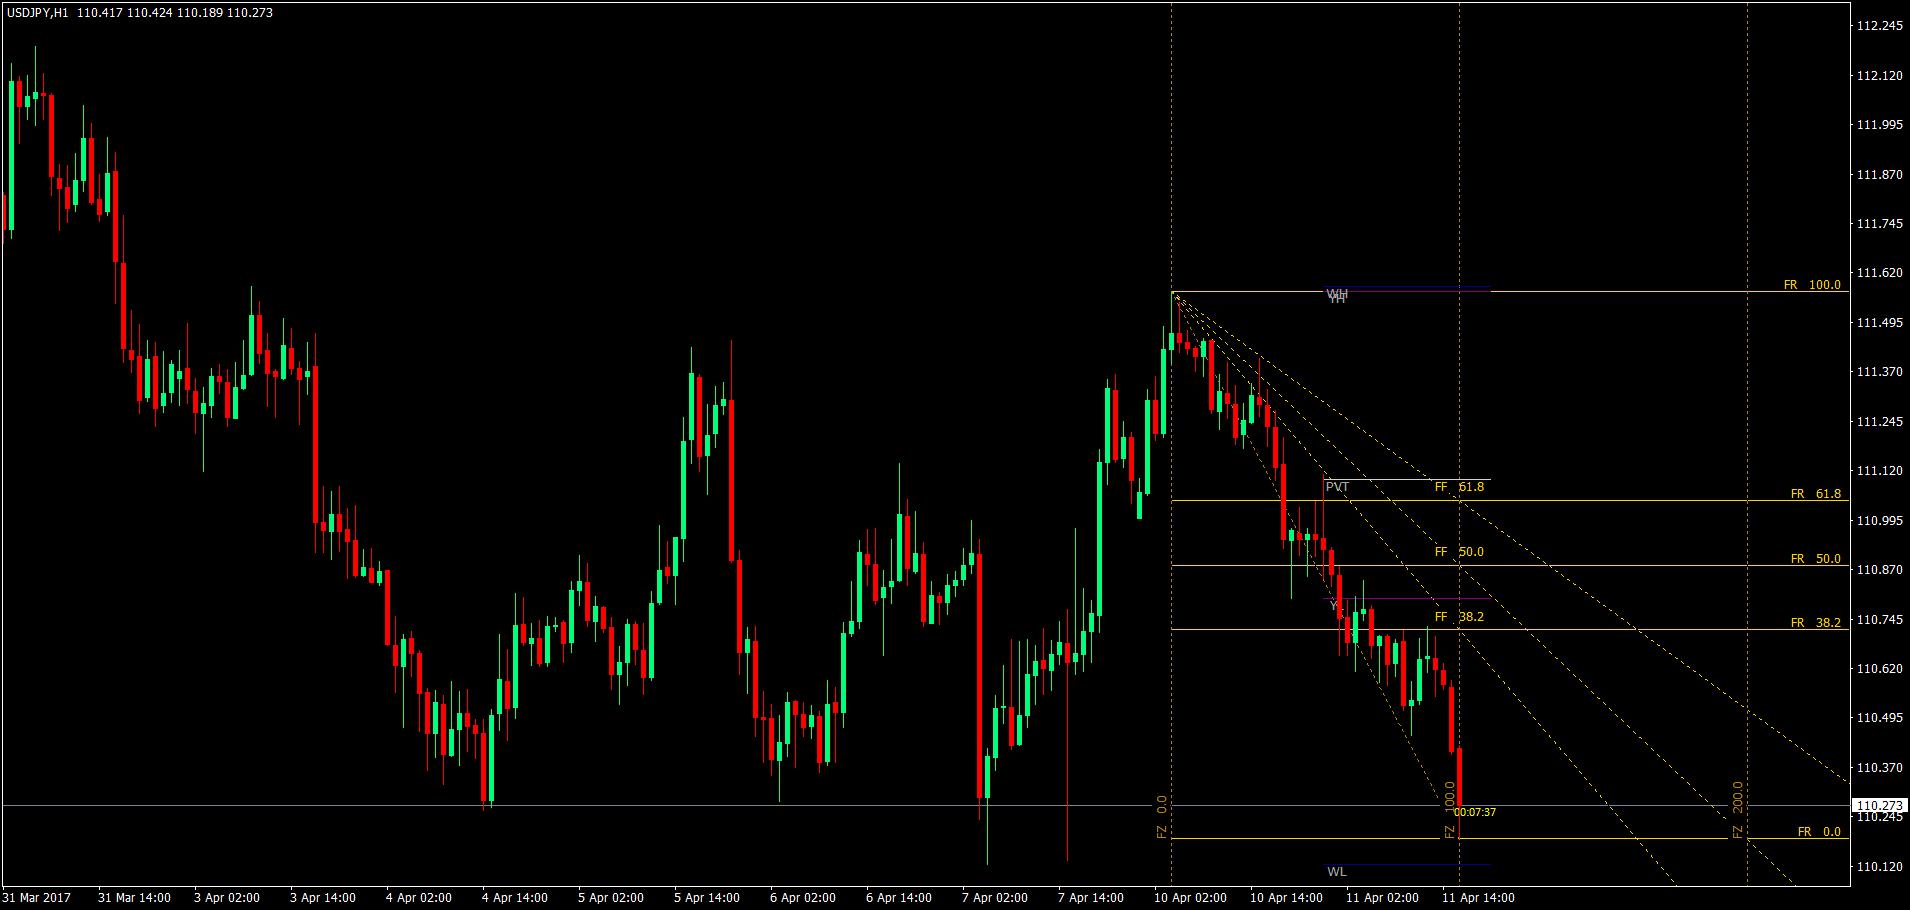 Trading strategy using fibonacci